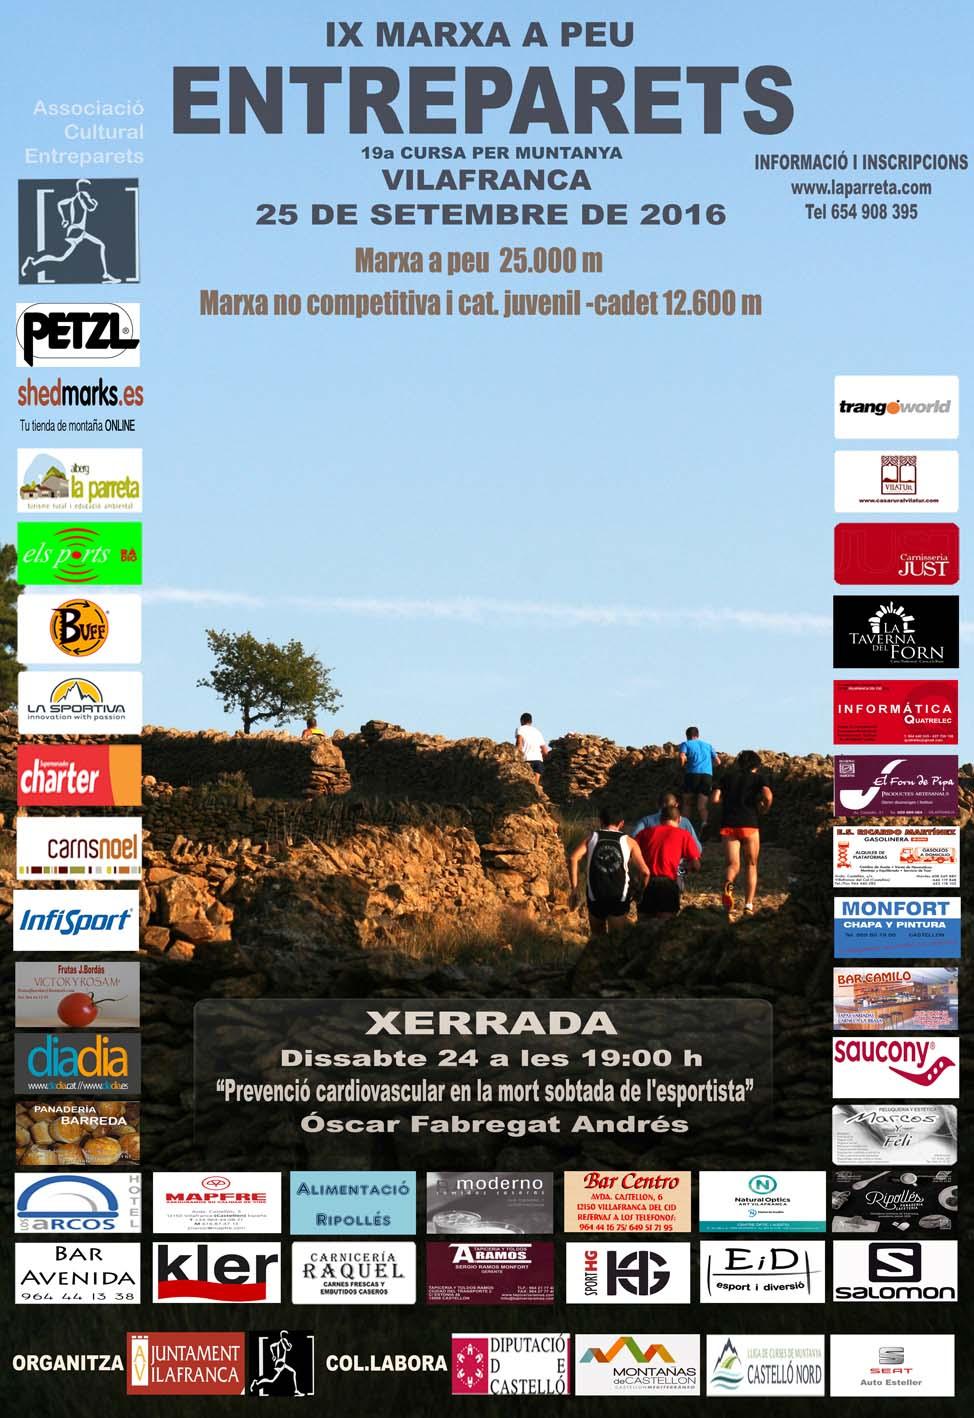 vilafranca-entreparets-2016_web